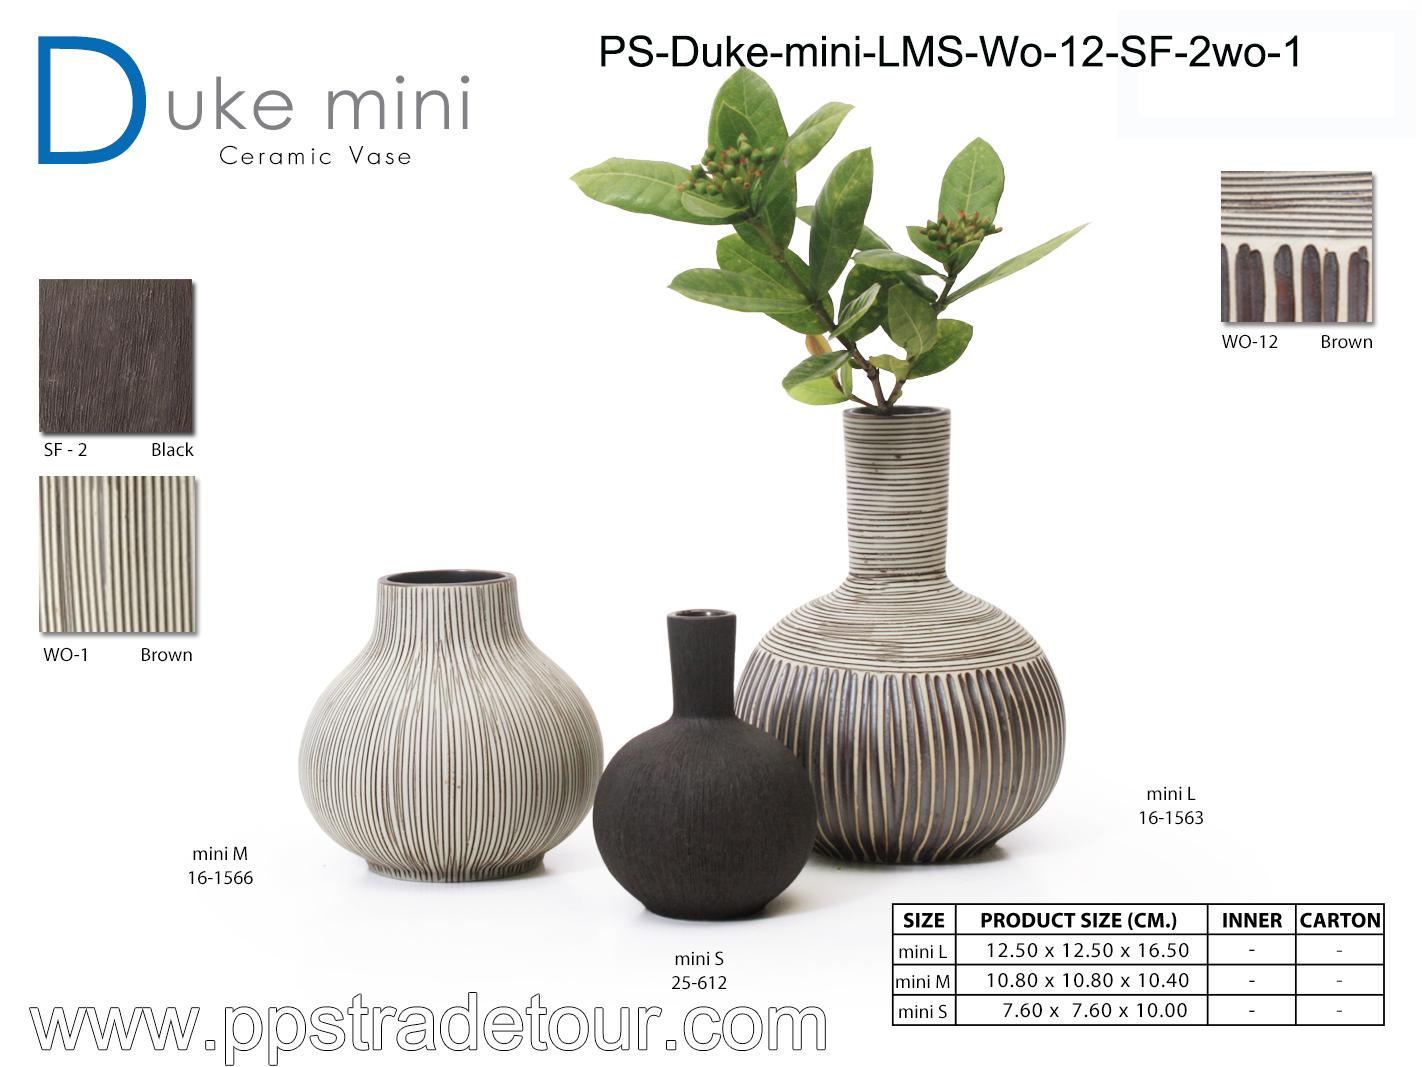 PSCV-Duke-mini-LMS-WO-12-SF-2WO-1